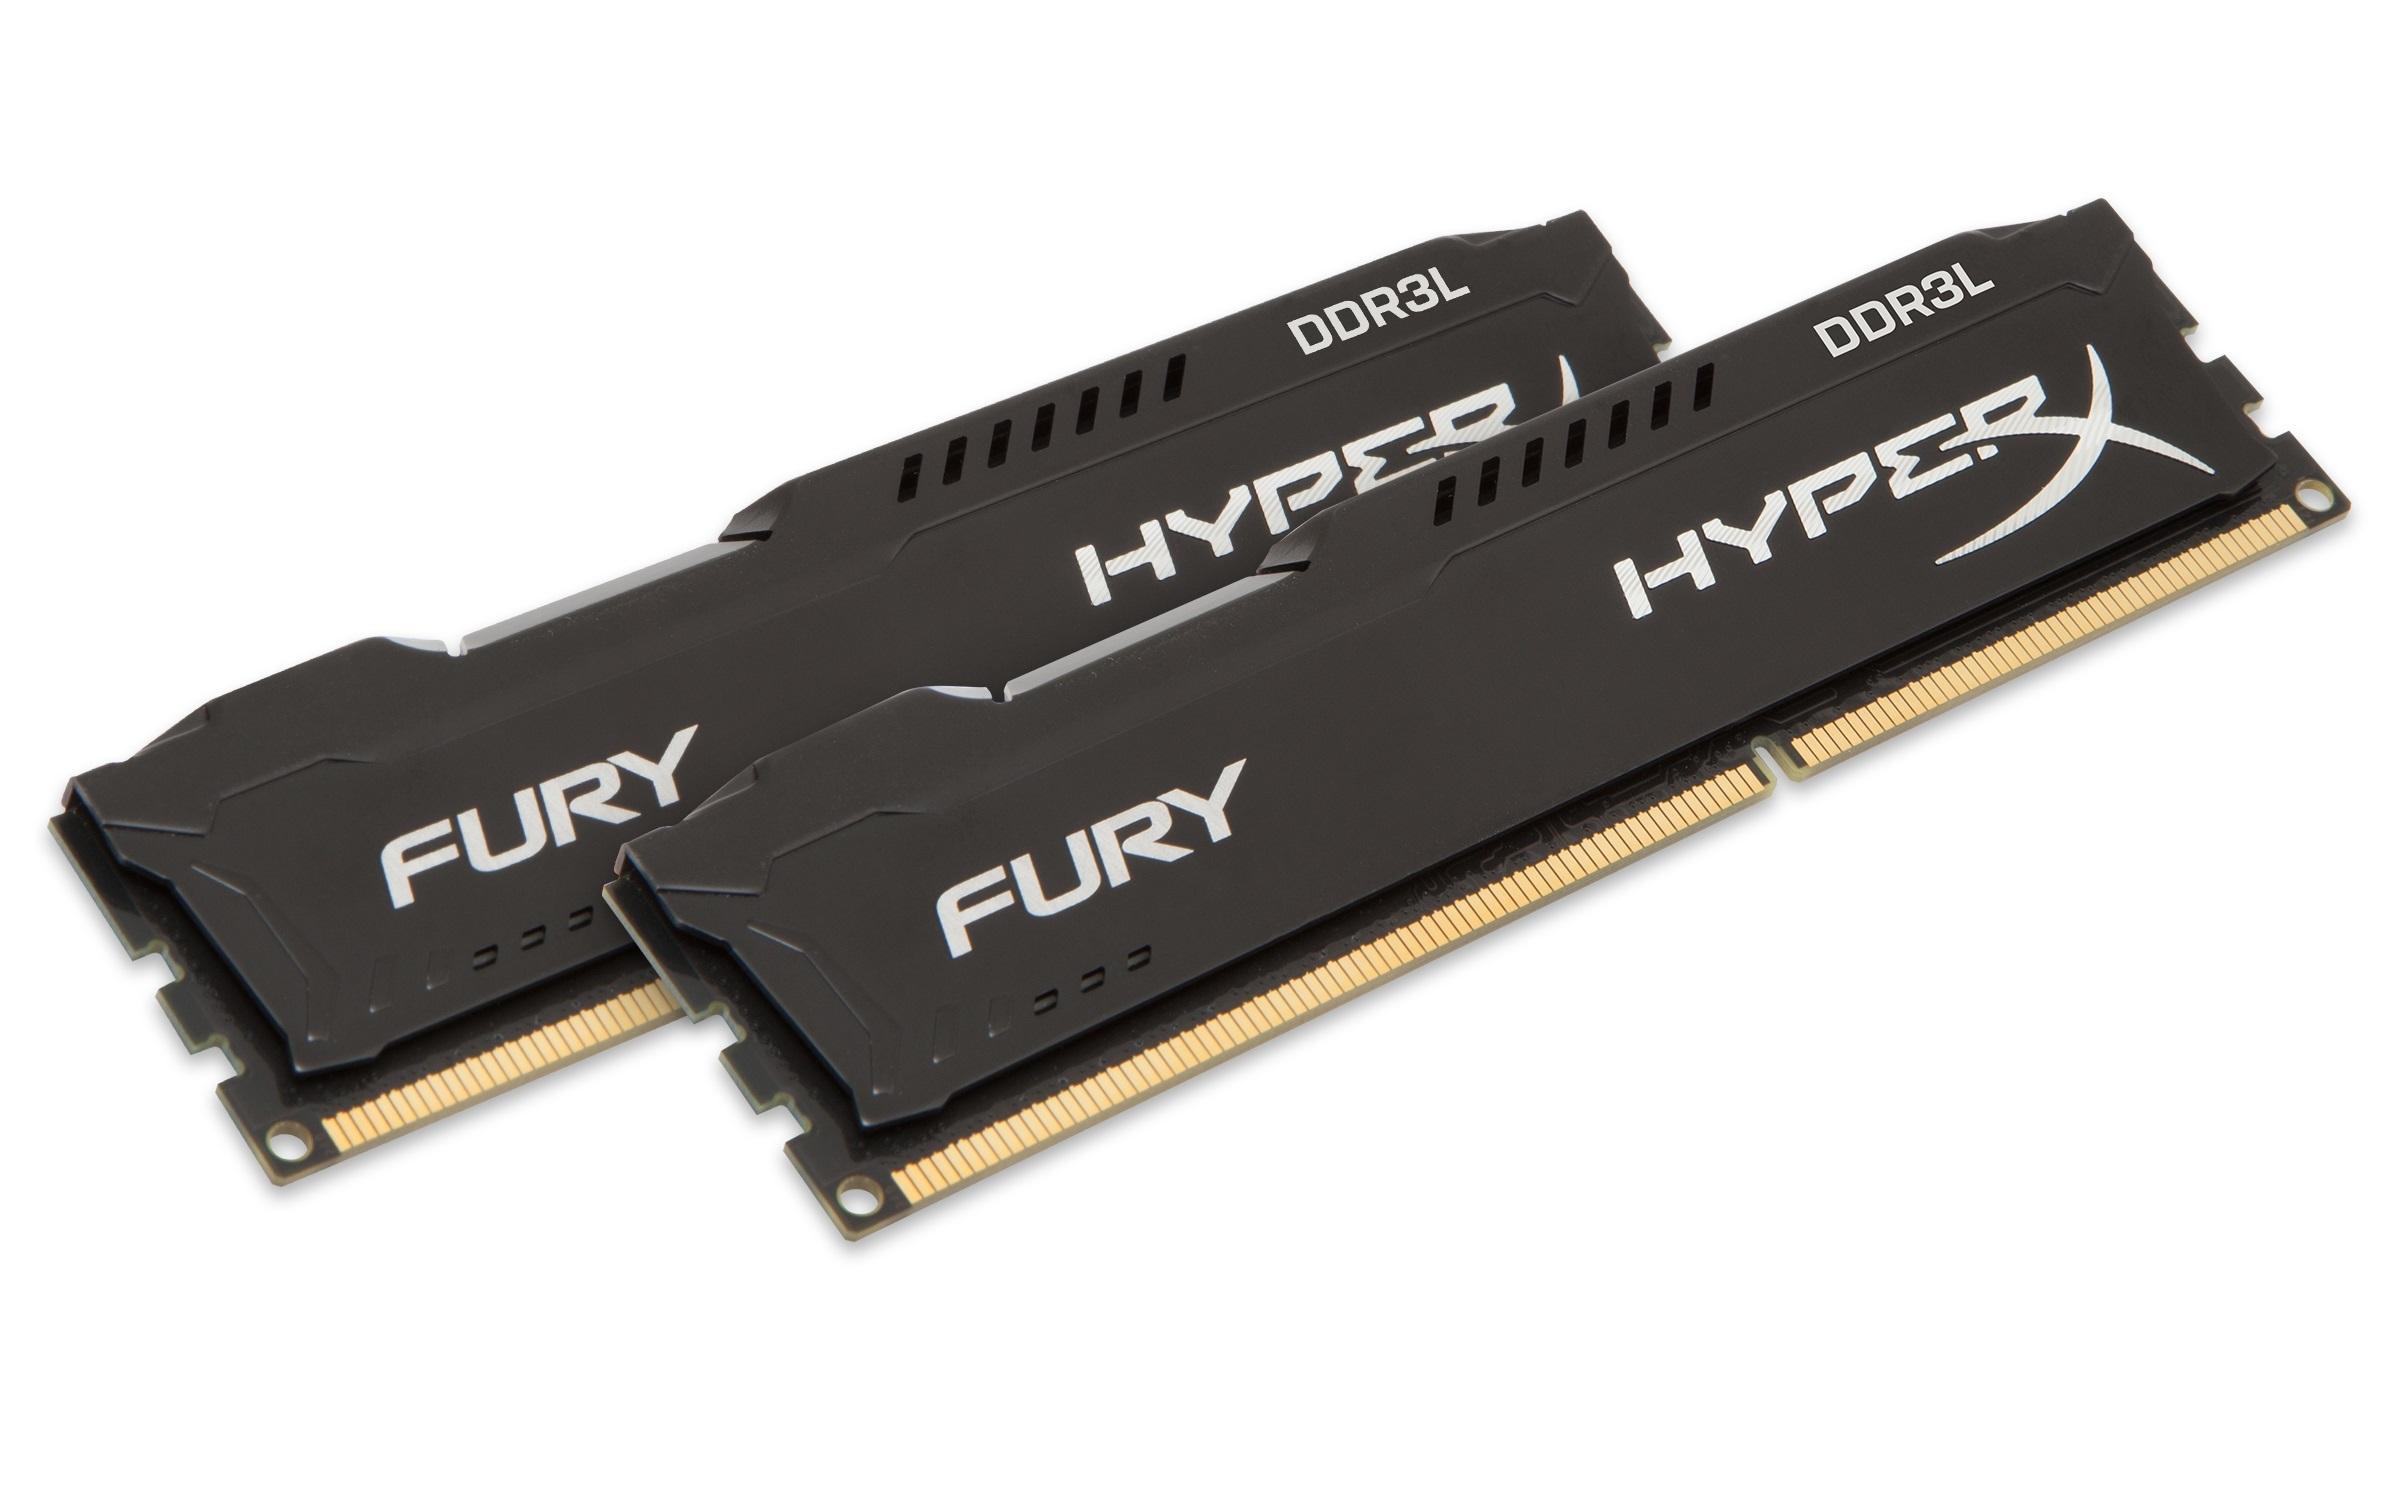 8GB DDR3L-1600MHz  HyperX Fury Black, 2x4GB - HX316LC10FBK2/8